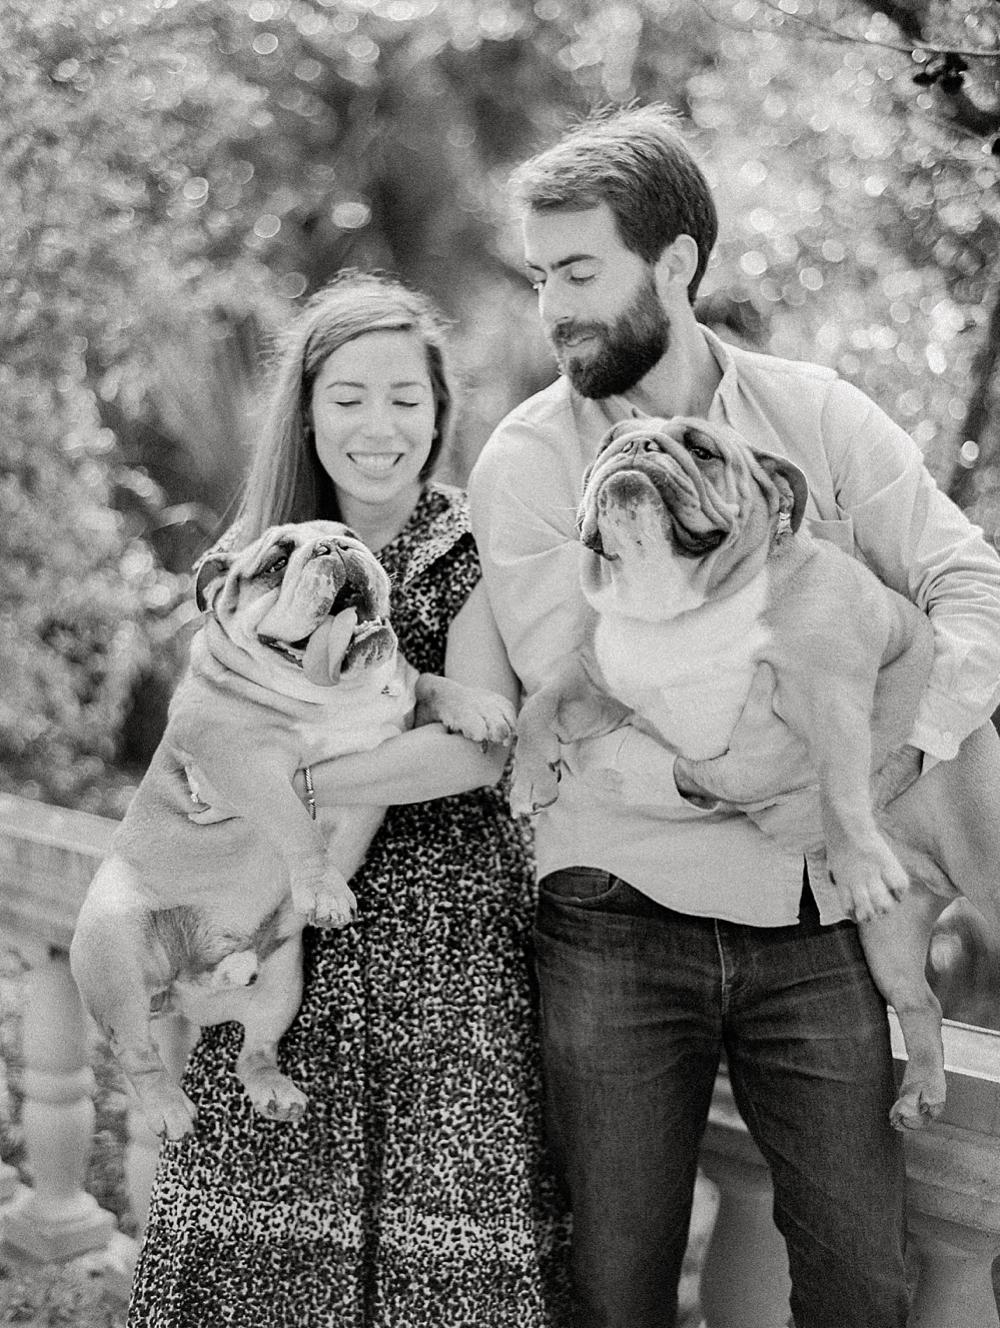 kristin-la-voie-photography-Austin-Wedding-Photographer-laguna-gloria-commodore-perry-estate-engagement-8